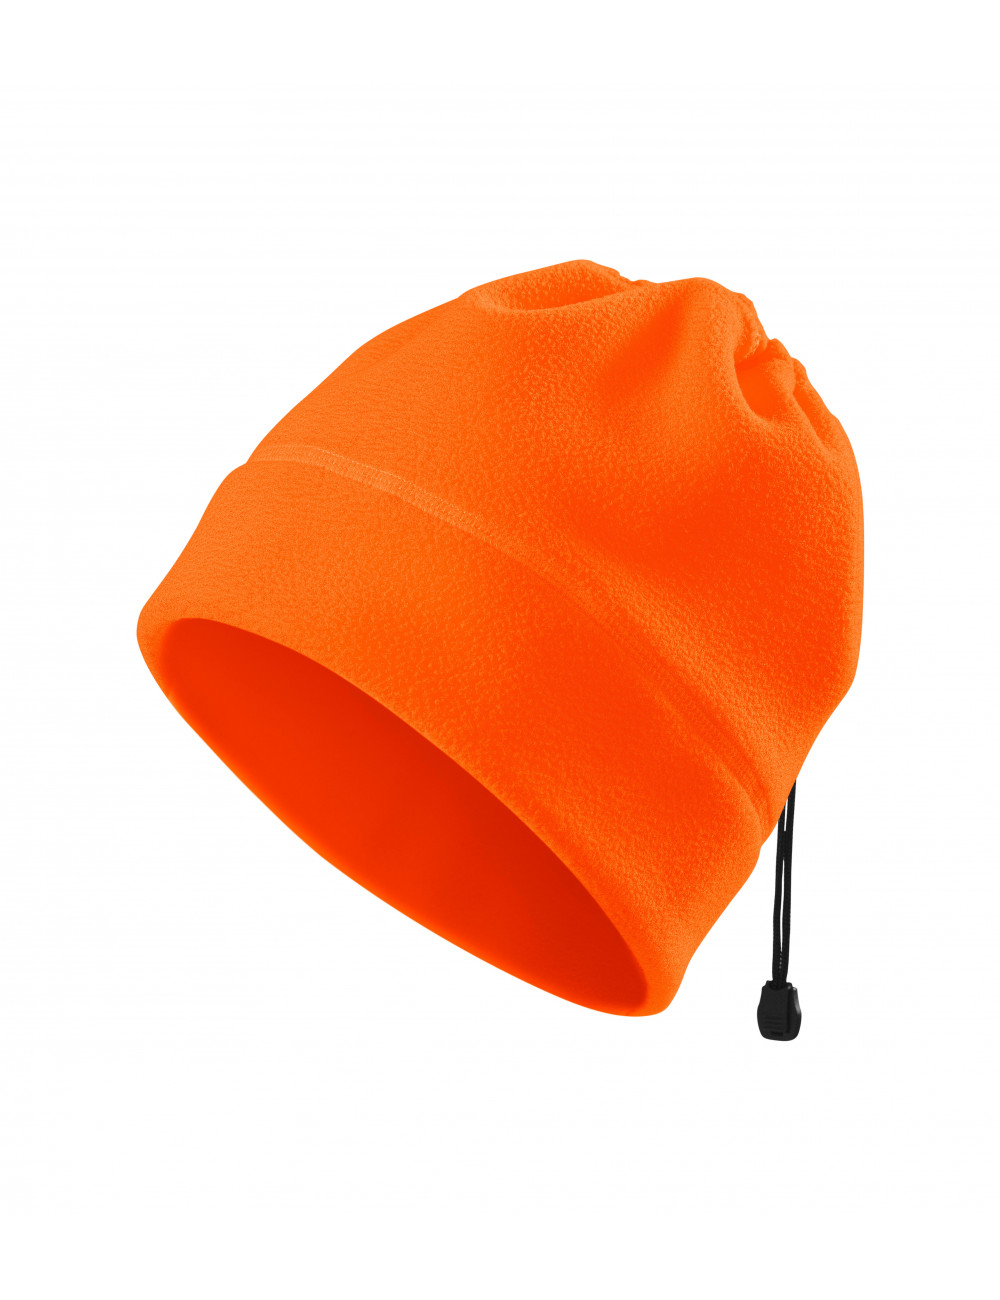 Adler RIMECK Czapka polarowa unisex HV Practic 5V9 odblaskowo pomarańczowy